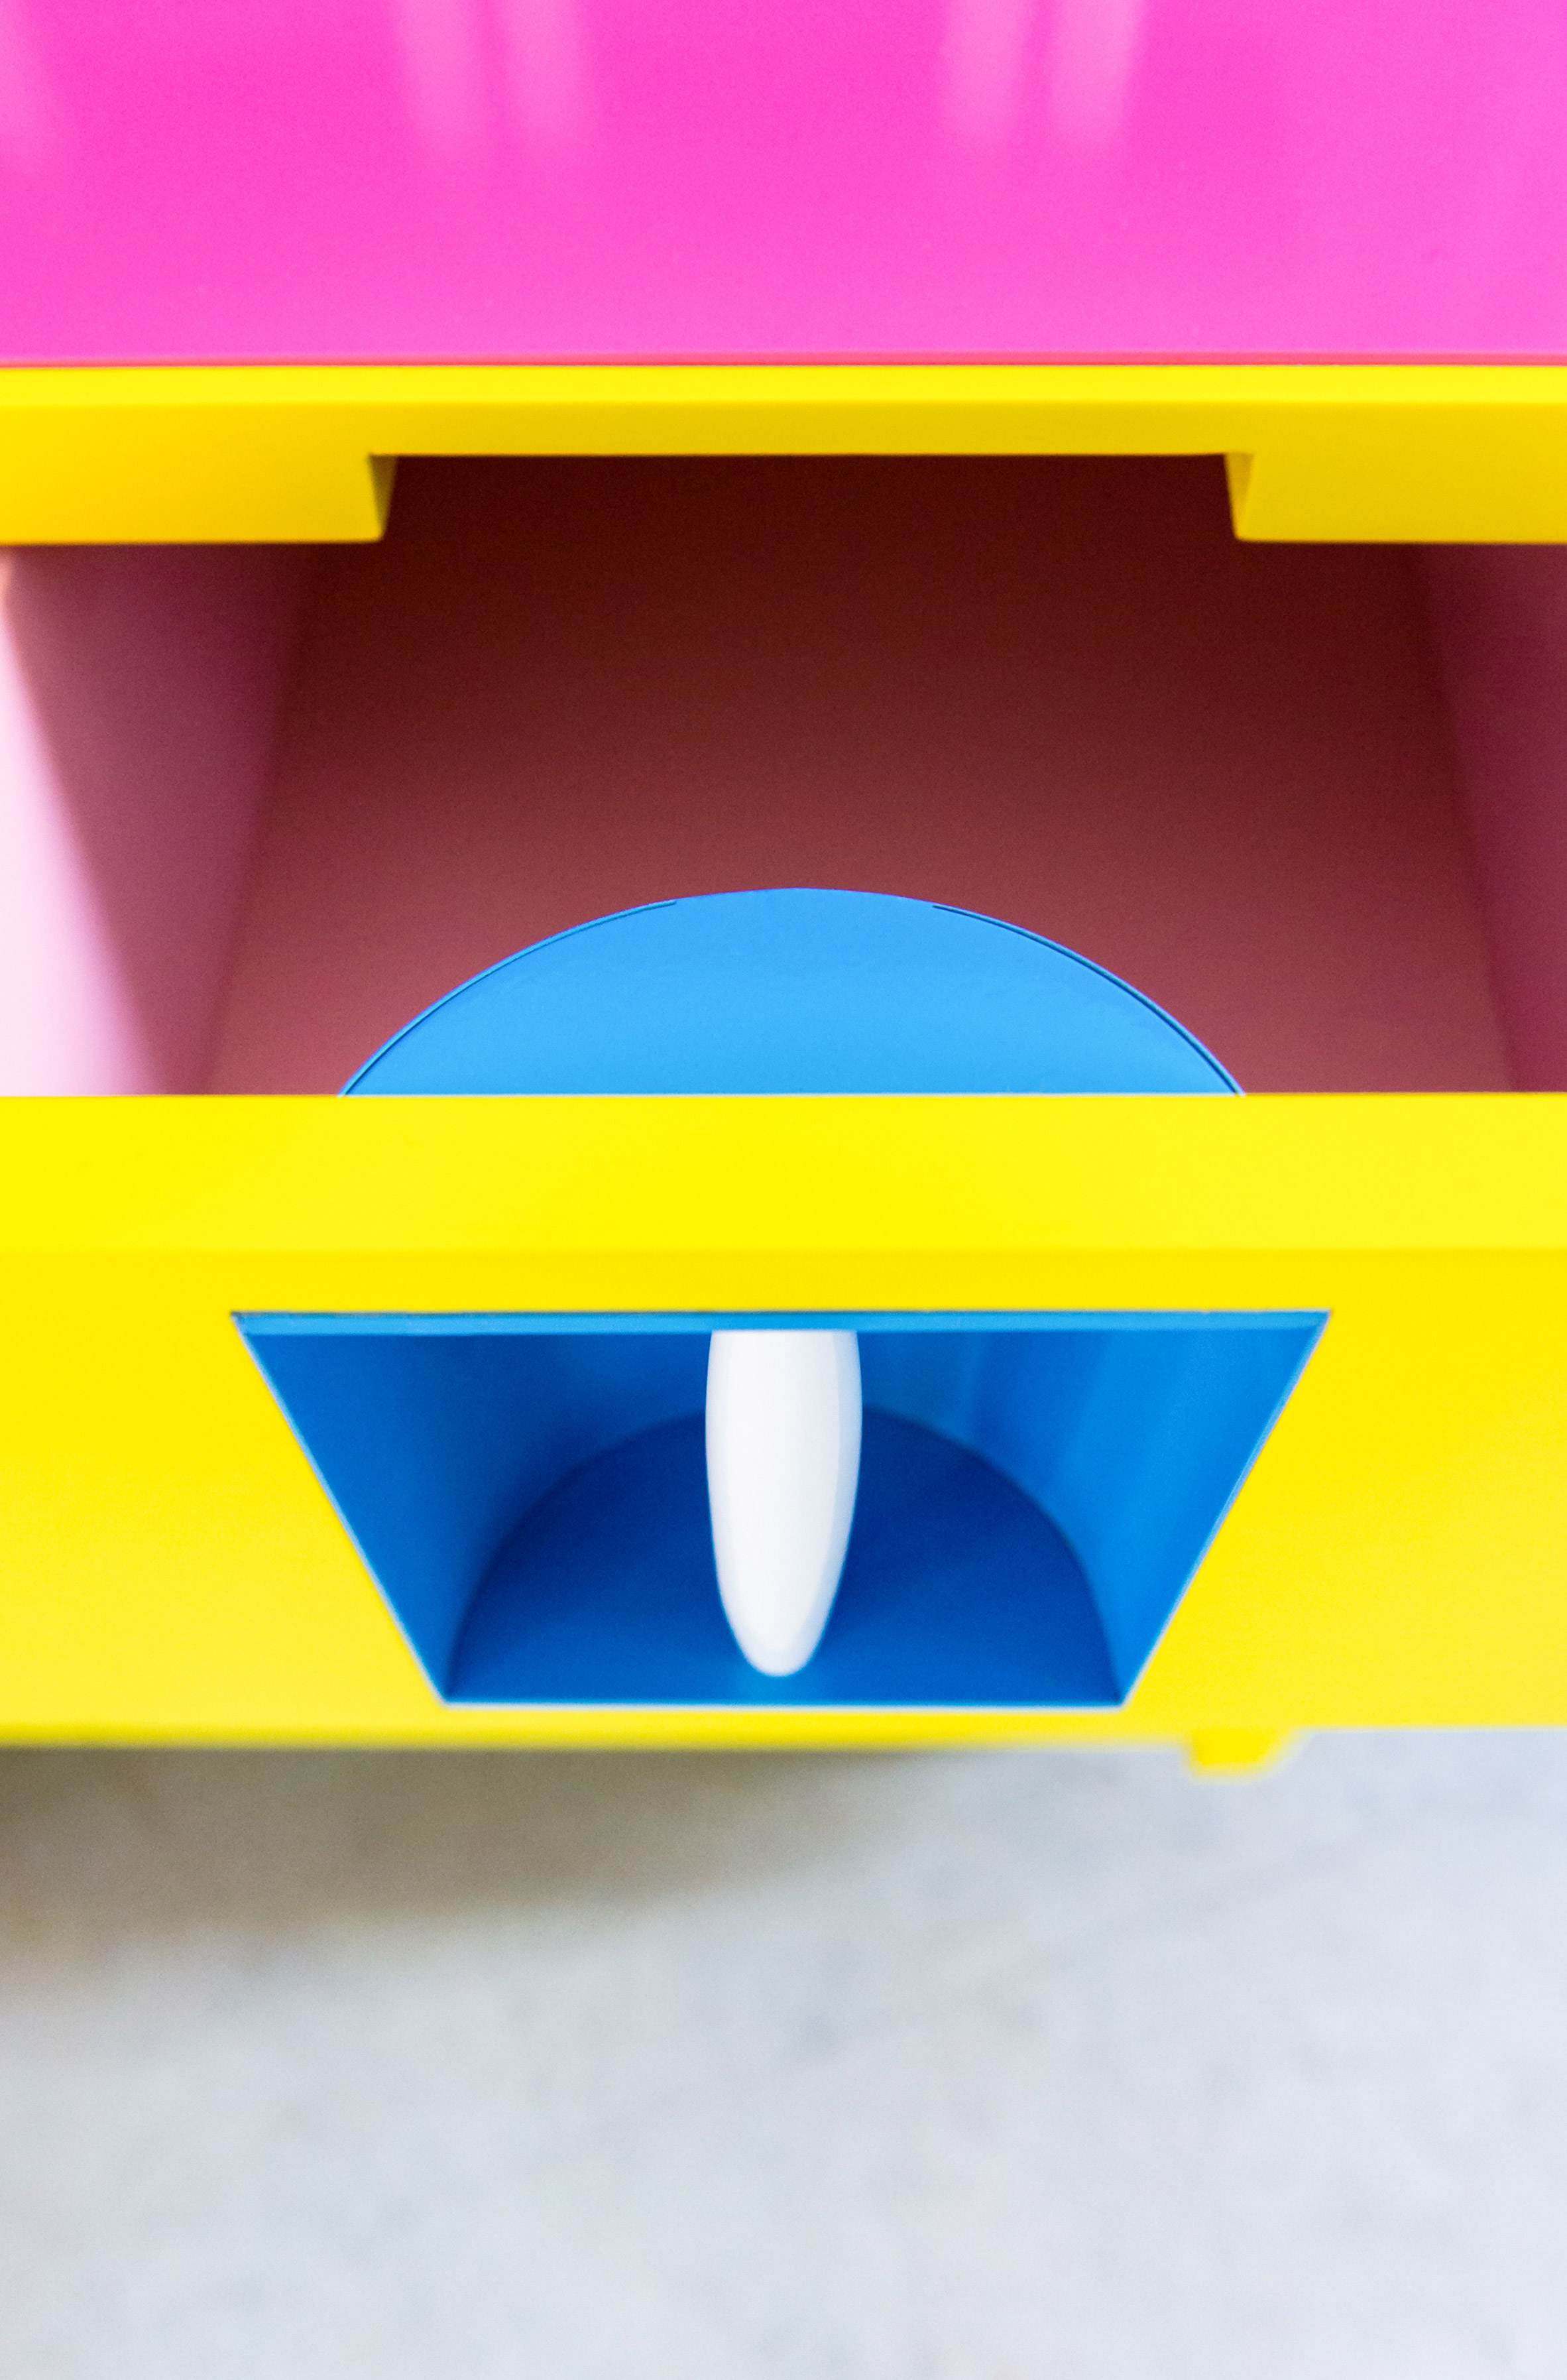 nakano-twins-adam-nathaniel-furman-furniture-design_dezeen_2364_col_25.jpg